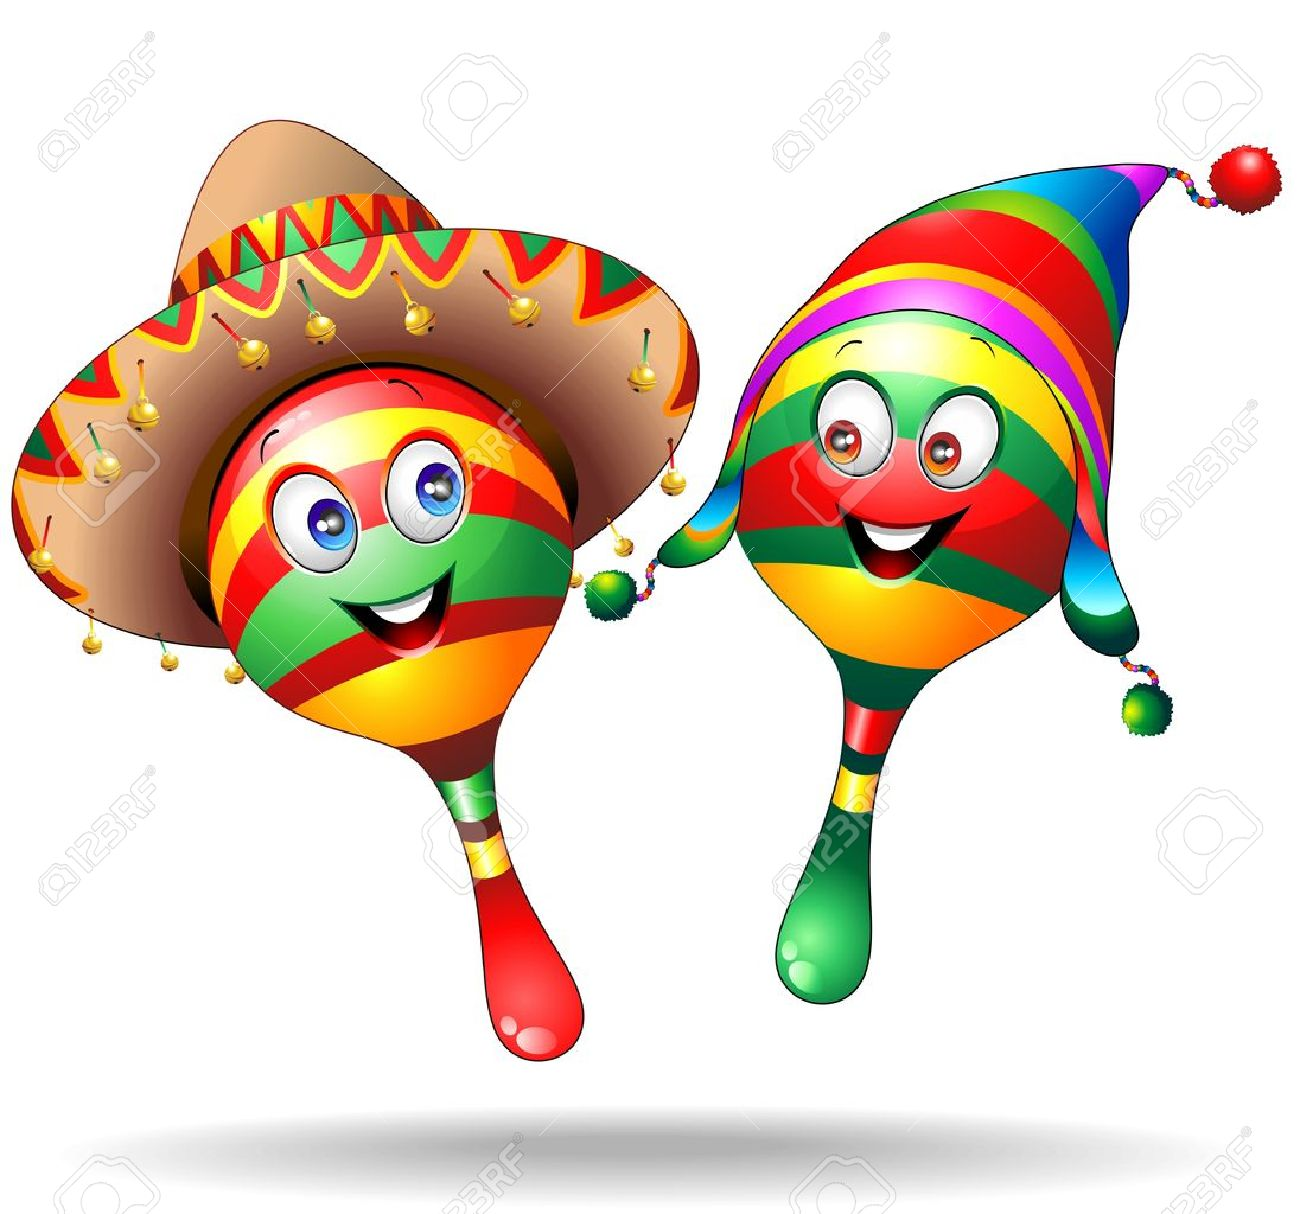 Maracas Cartoon Characters with Sombrero and Llucho Stock Vector - 18587243